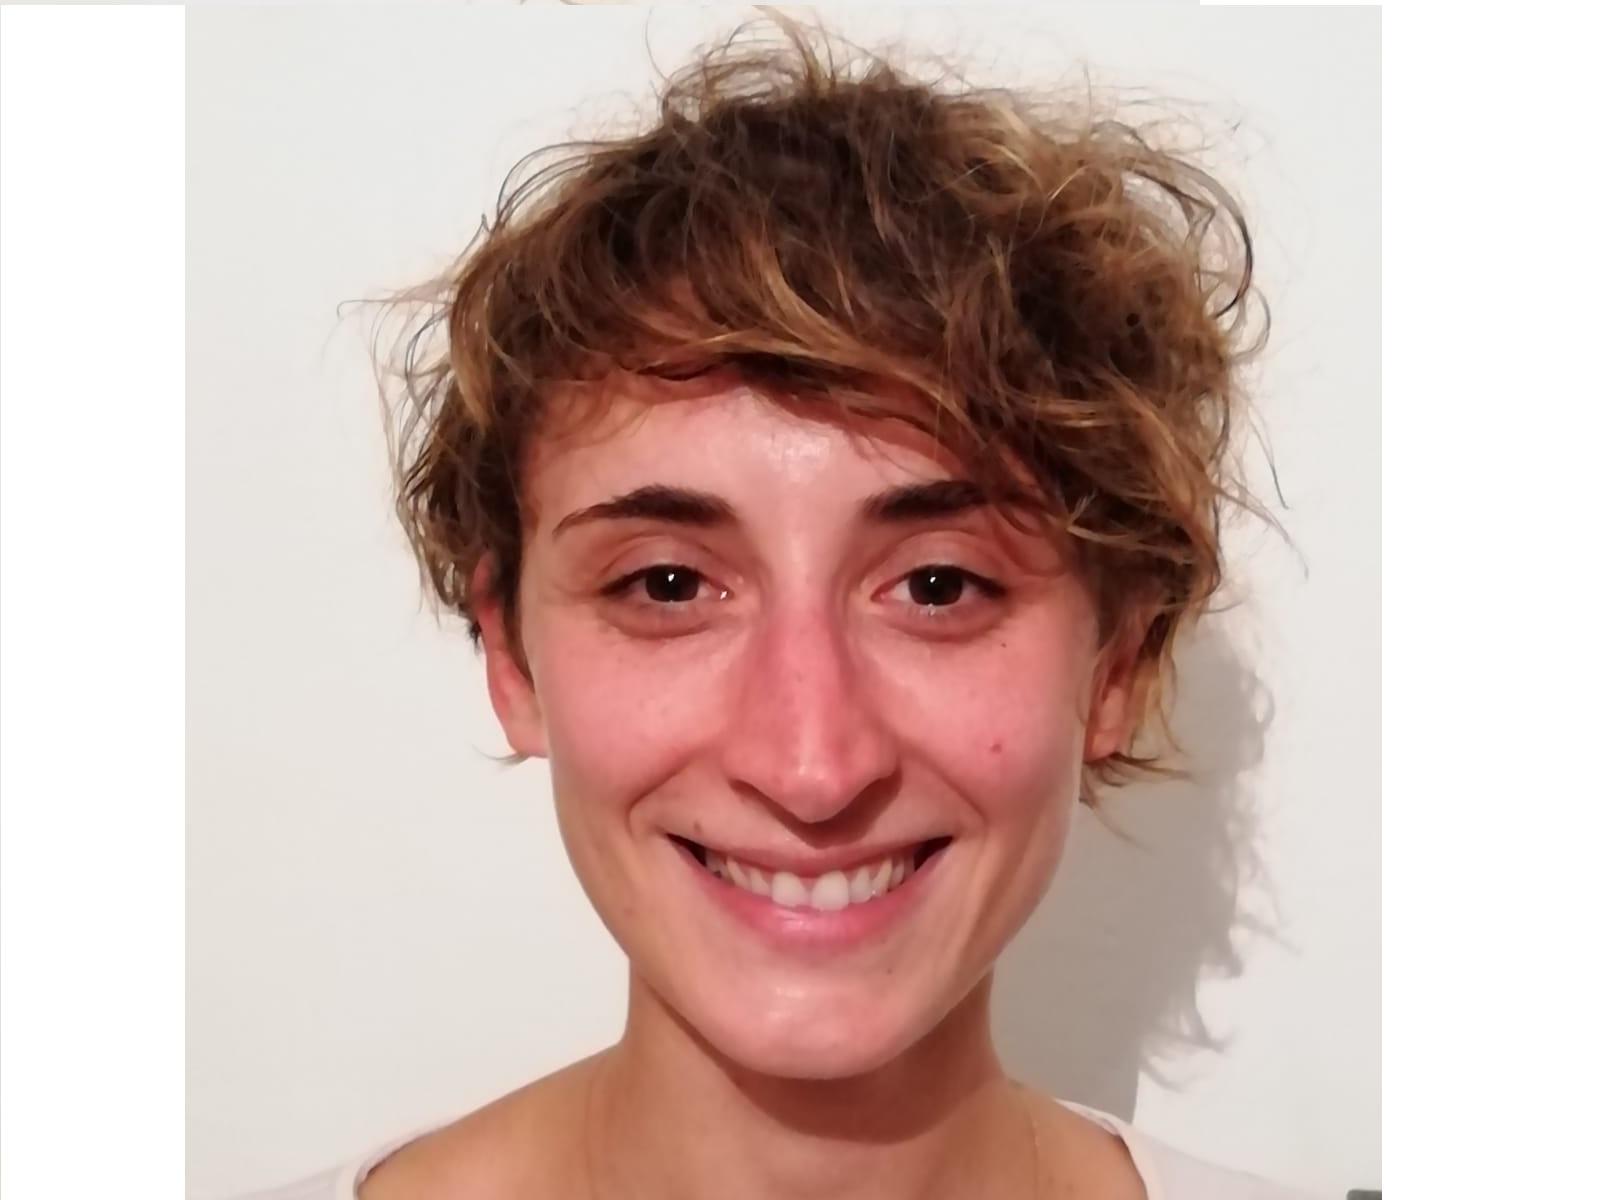 Chiara Bovolenta